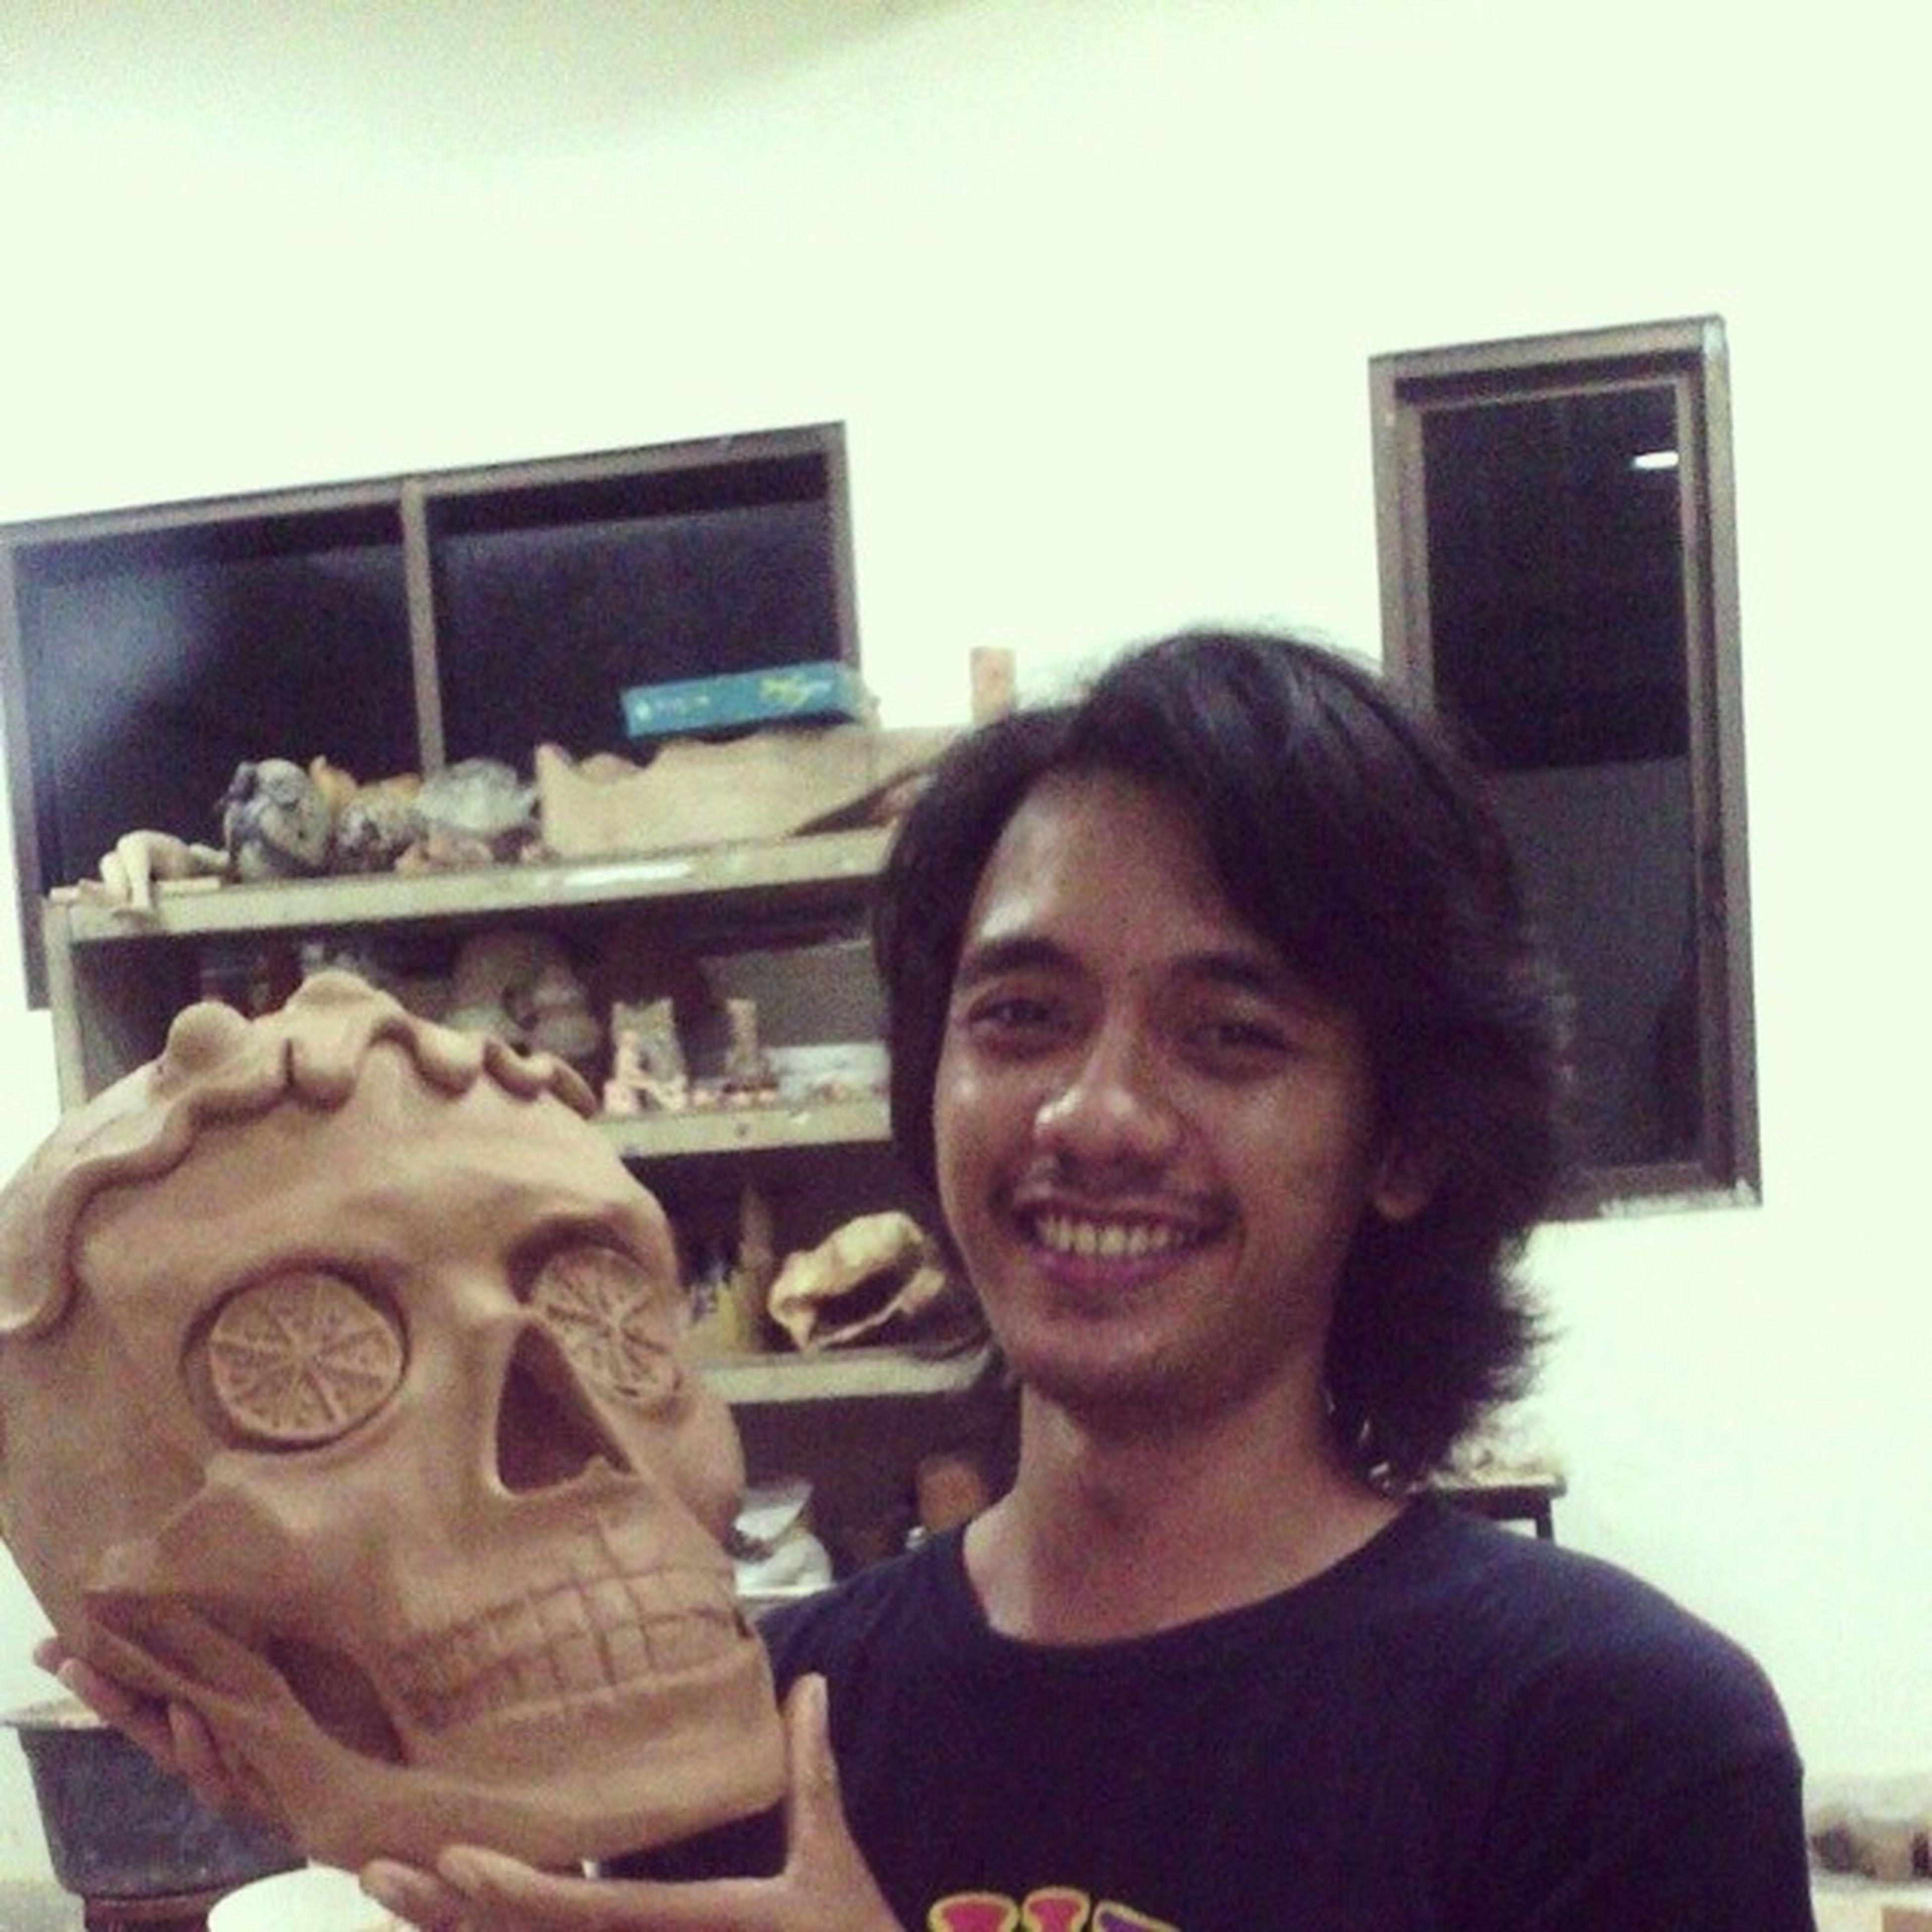 Skull Tengkorak Mahaputravito Holiday clay tanahliat stoneware ceramic keramik keramos art seni ars product produk yogyakarta galihjsnh